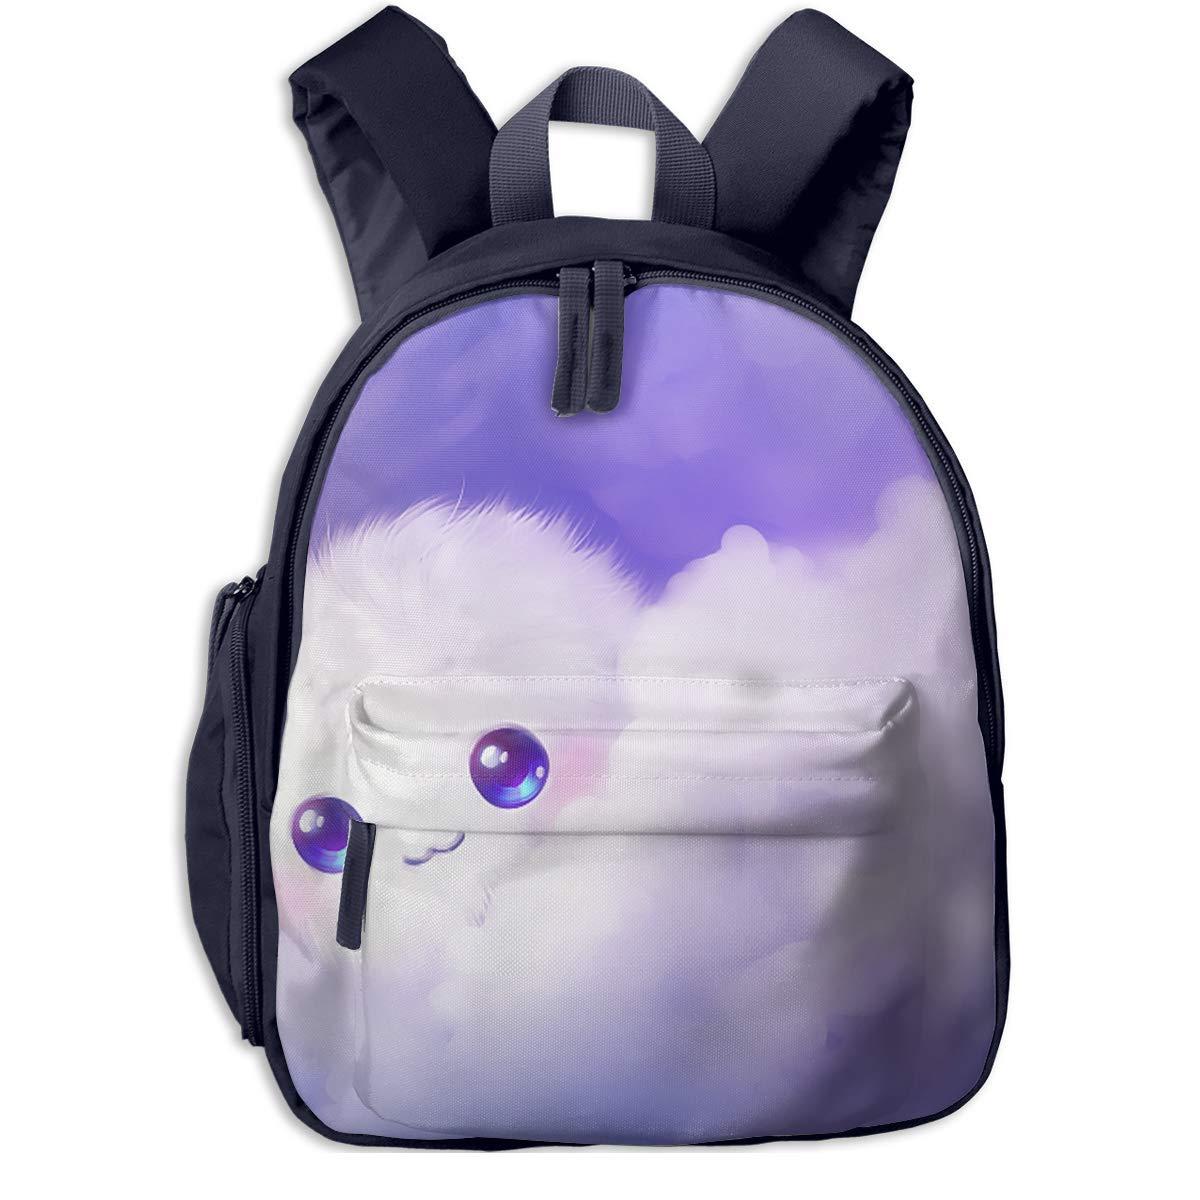 School Backpack for Girls Boys, Kids Kids Kids Cute lila Cute Cound Cartoon Backpacks Book Bag B07MGXMR8C Daypacks Guter Markt ad3718